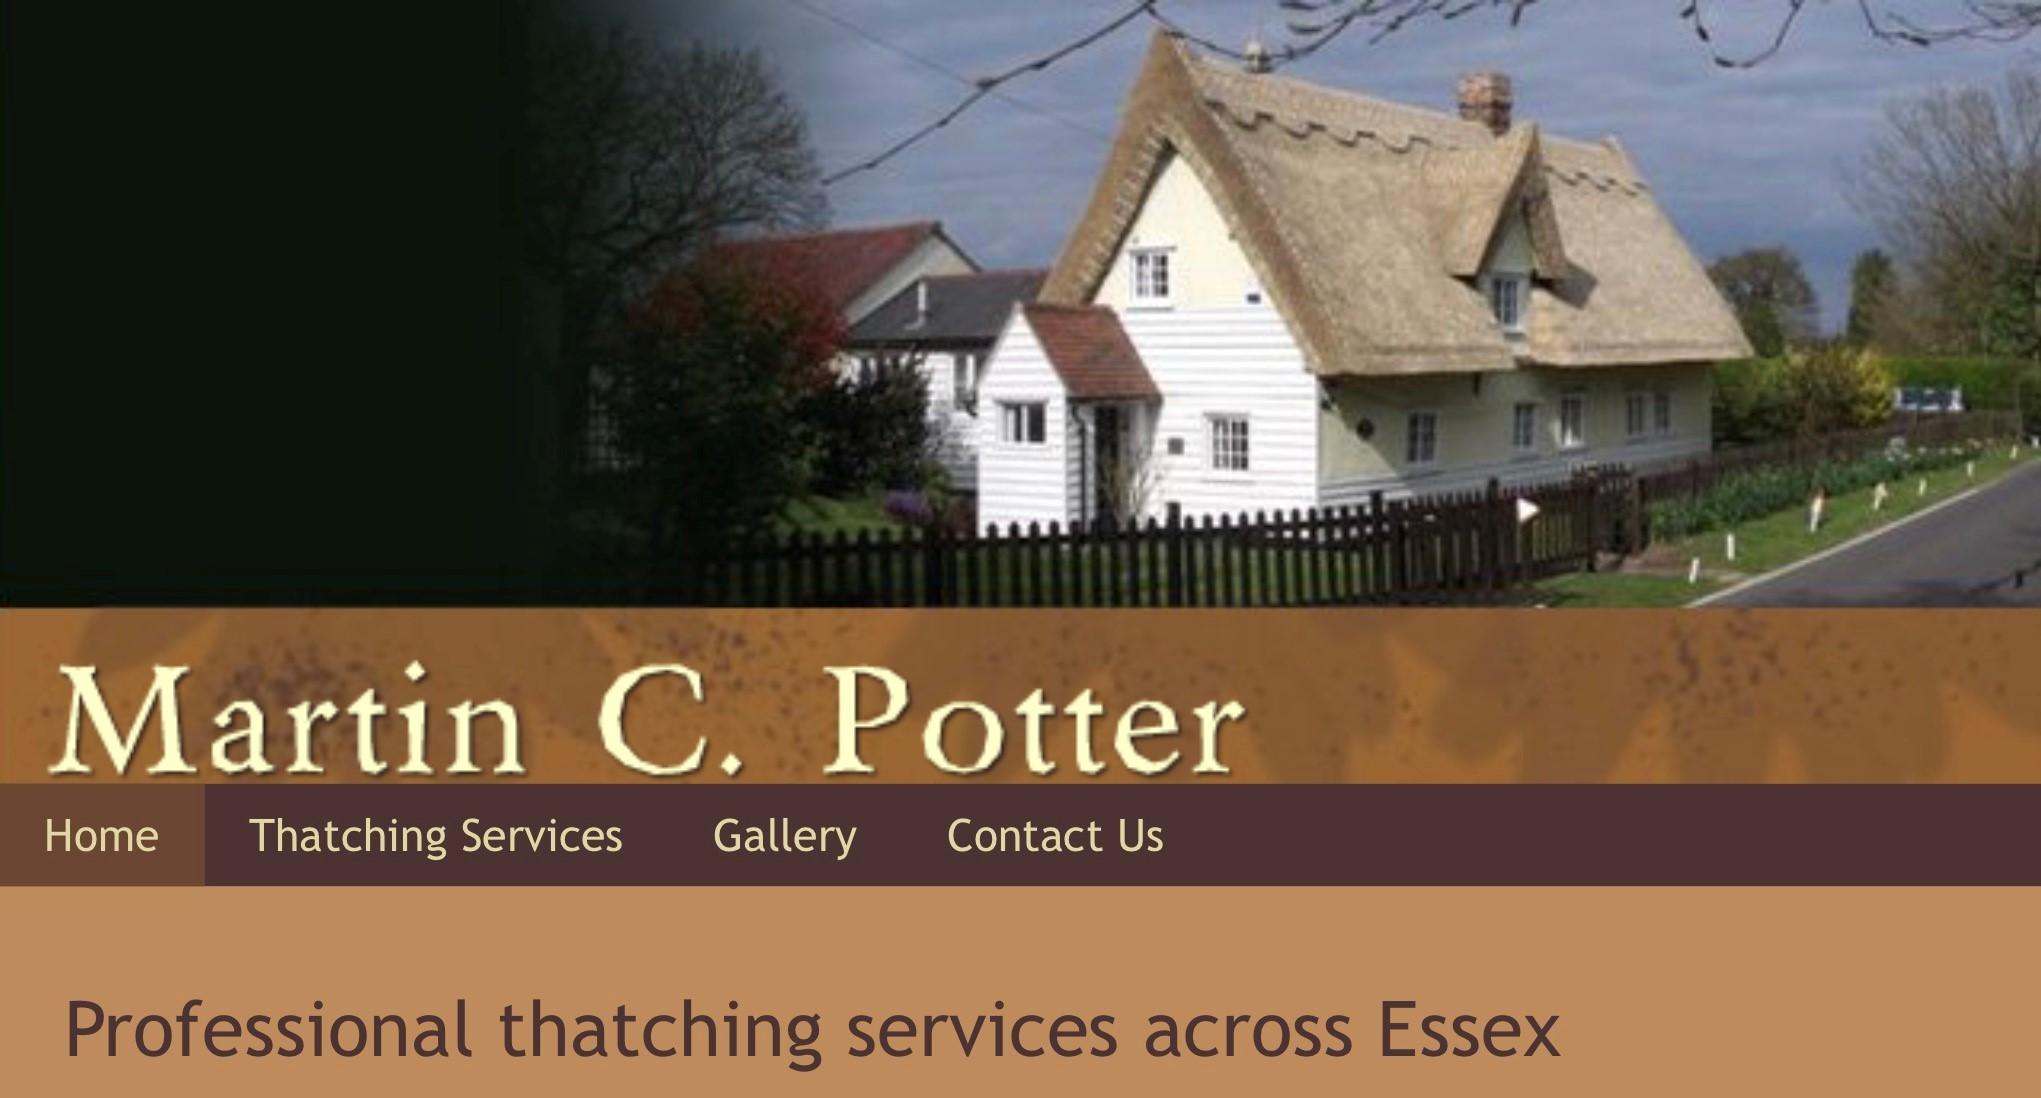 Masterthatcher (Martin C Potter)